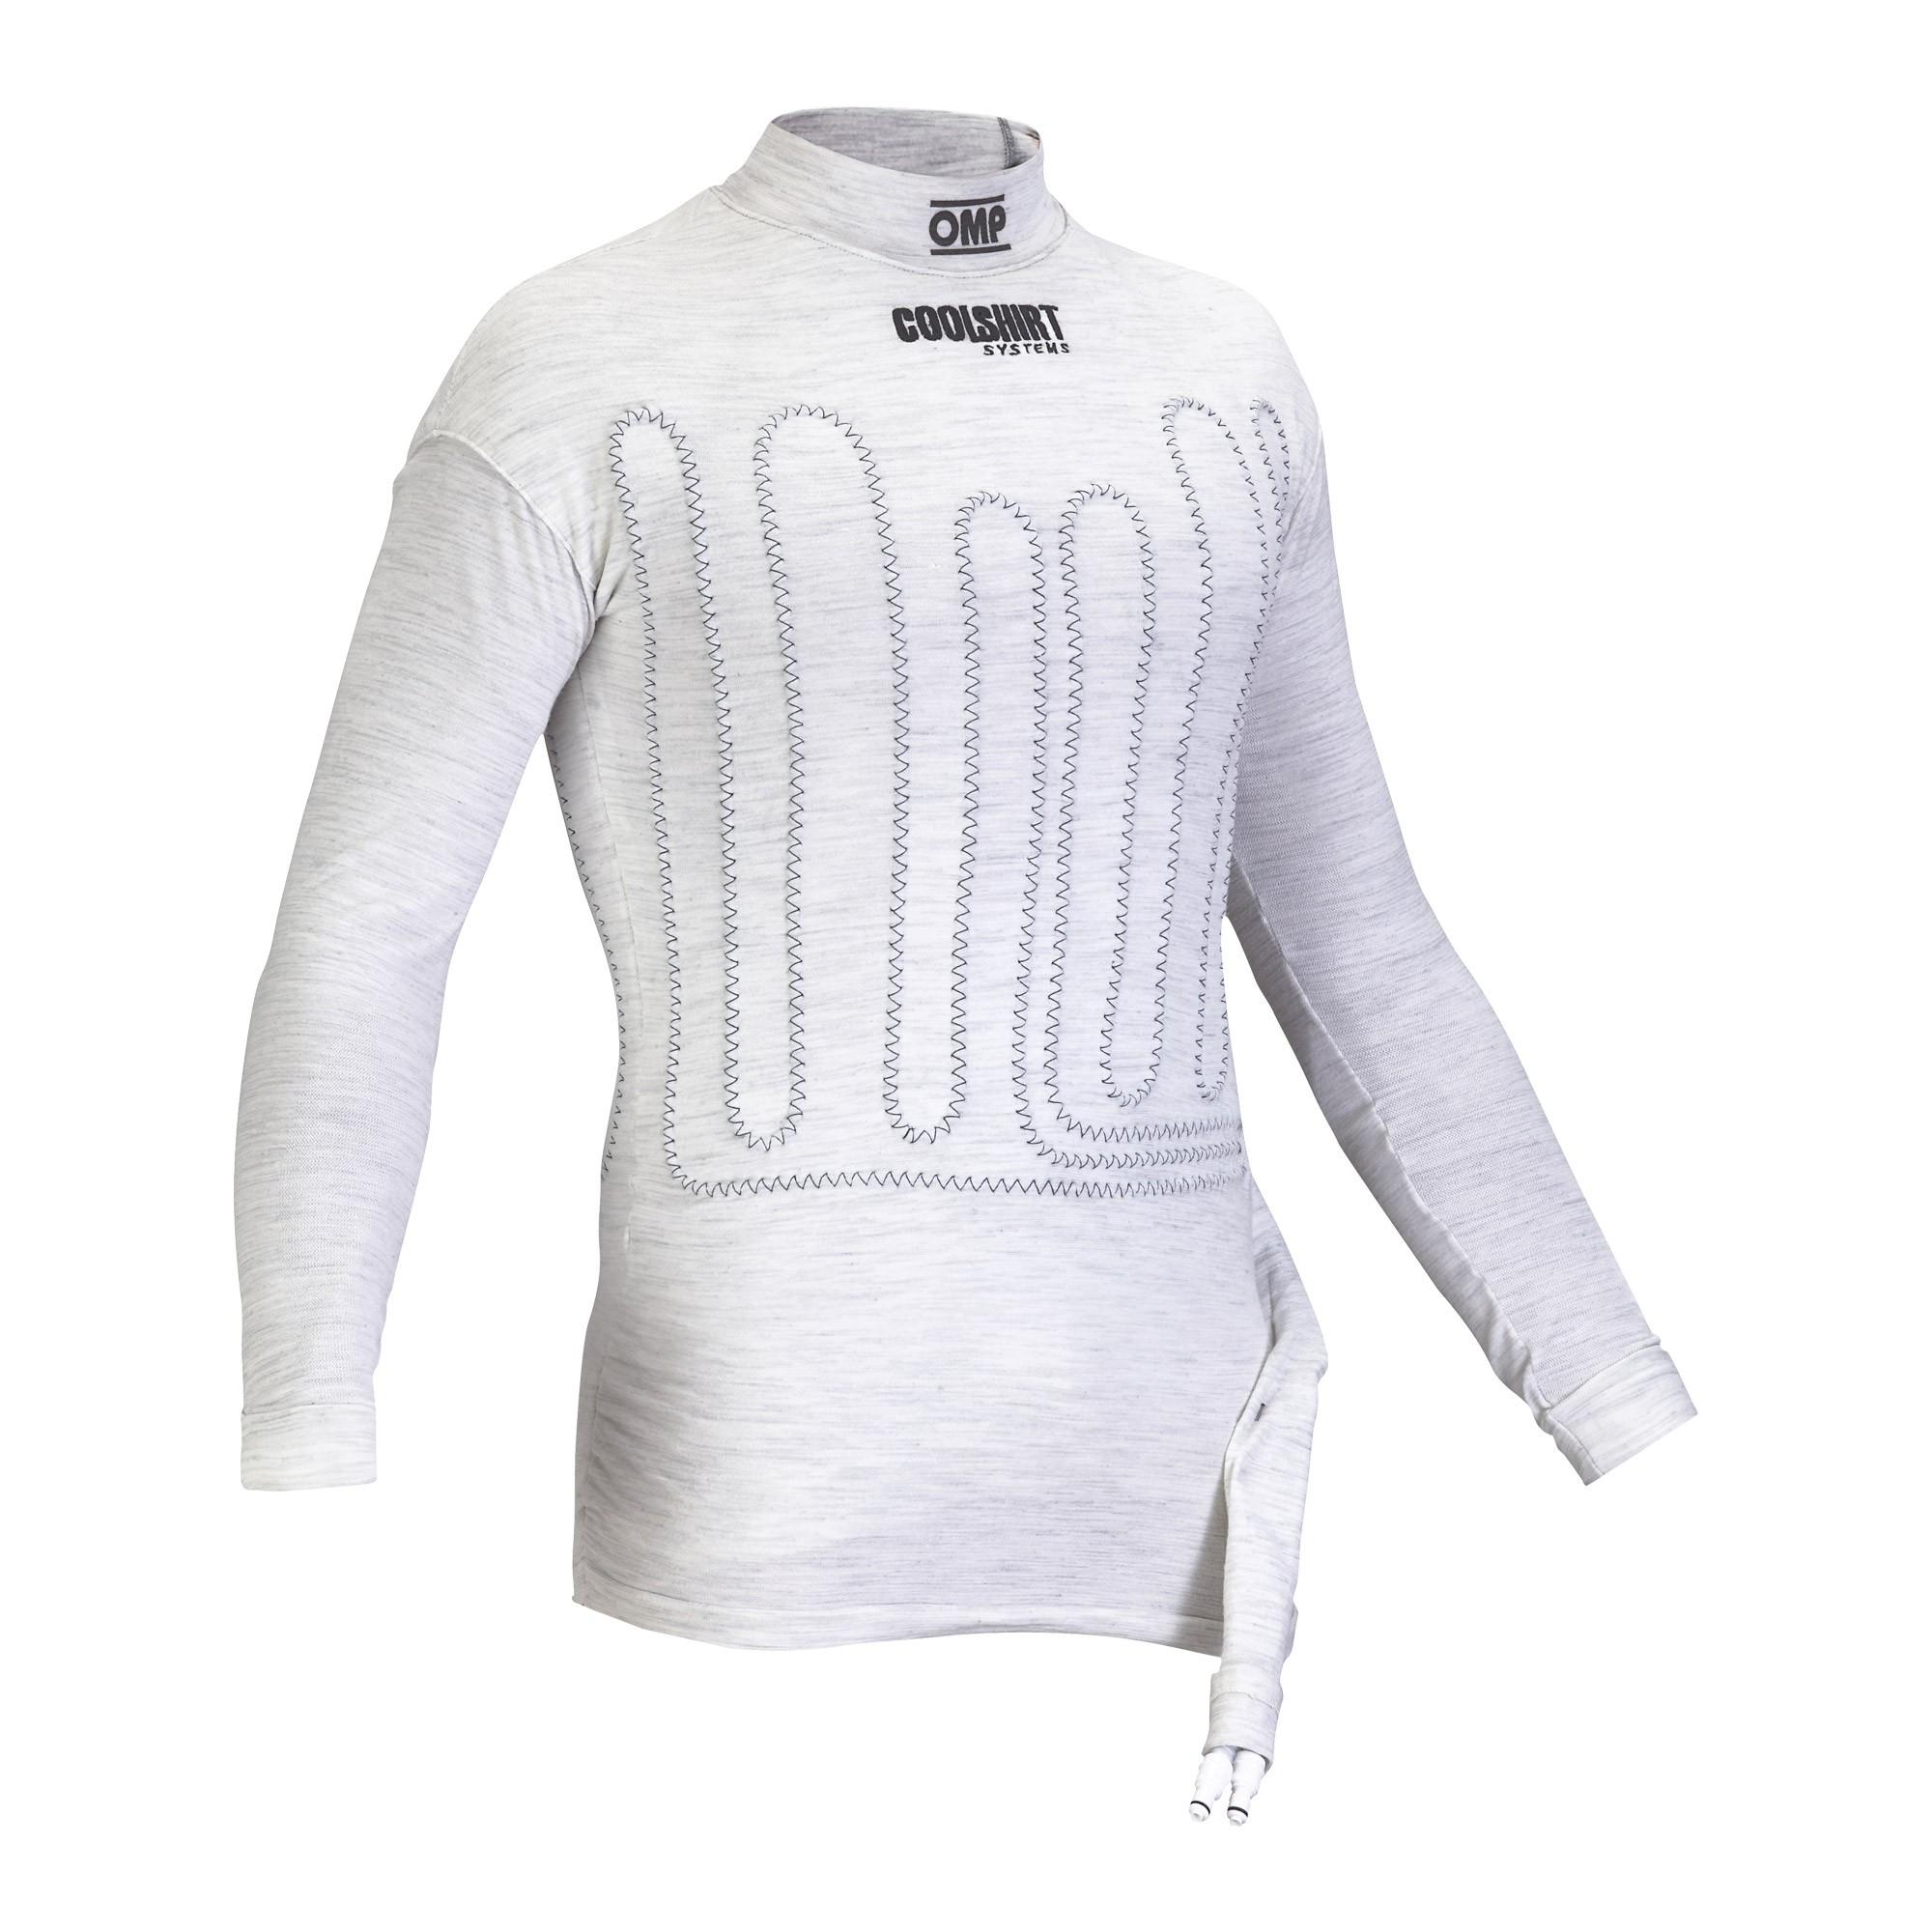 COOL SHIRT FIA TOP MEDIUM (M/L) WHITE